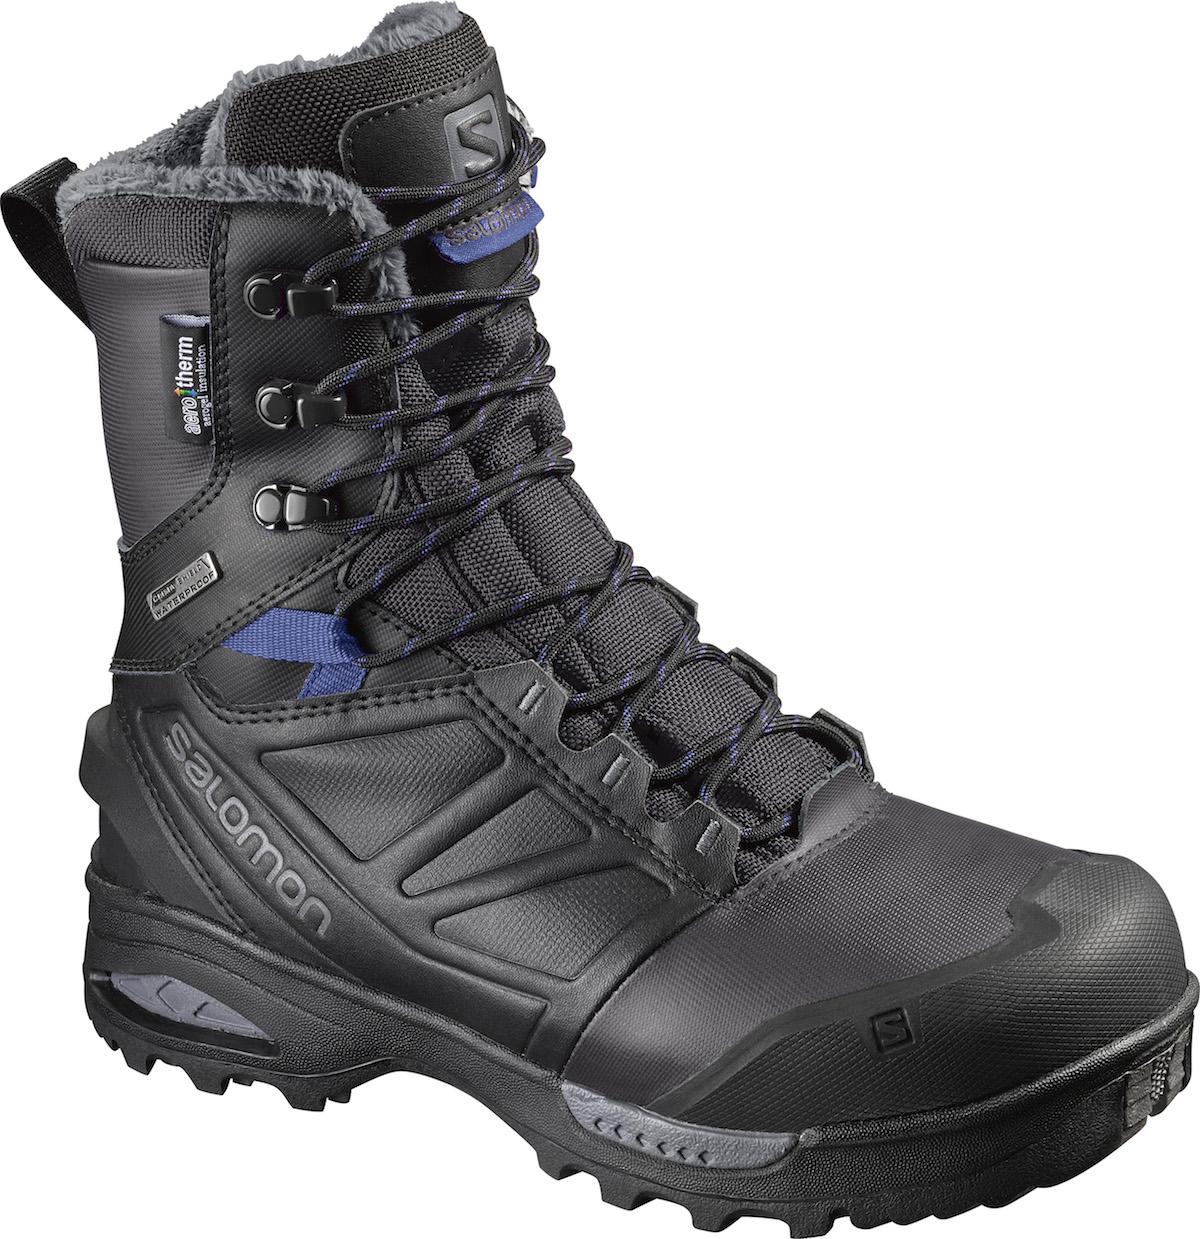 Salomon Toundra Pro CSWP W - Chaussures trekking femme